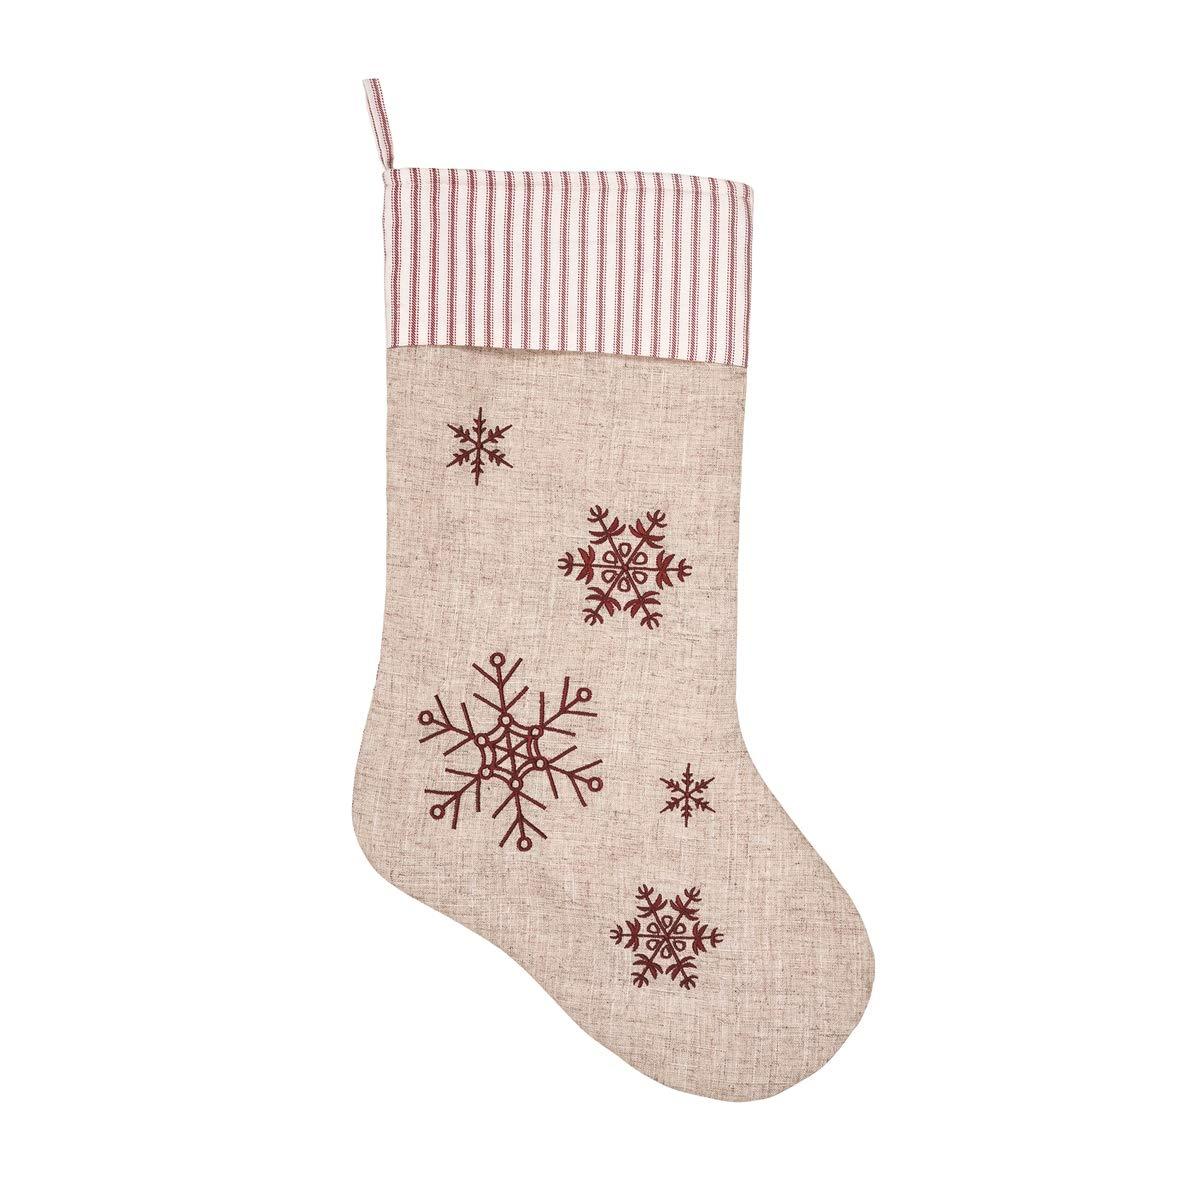 C/&F Home Snowflake Ticking Stripe Cuff Oatmeal Tan 20 x 9 Fabric Christmas Stocking